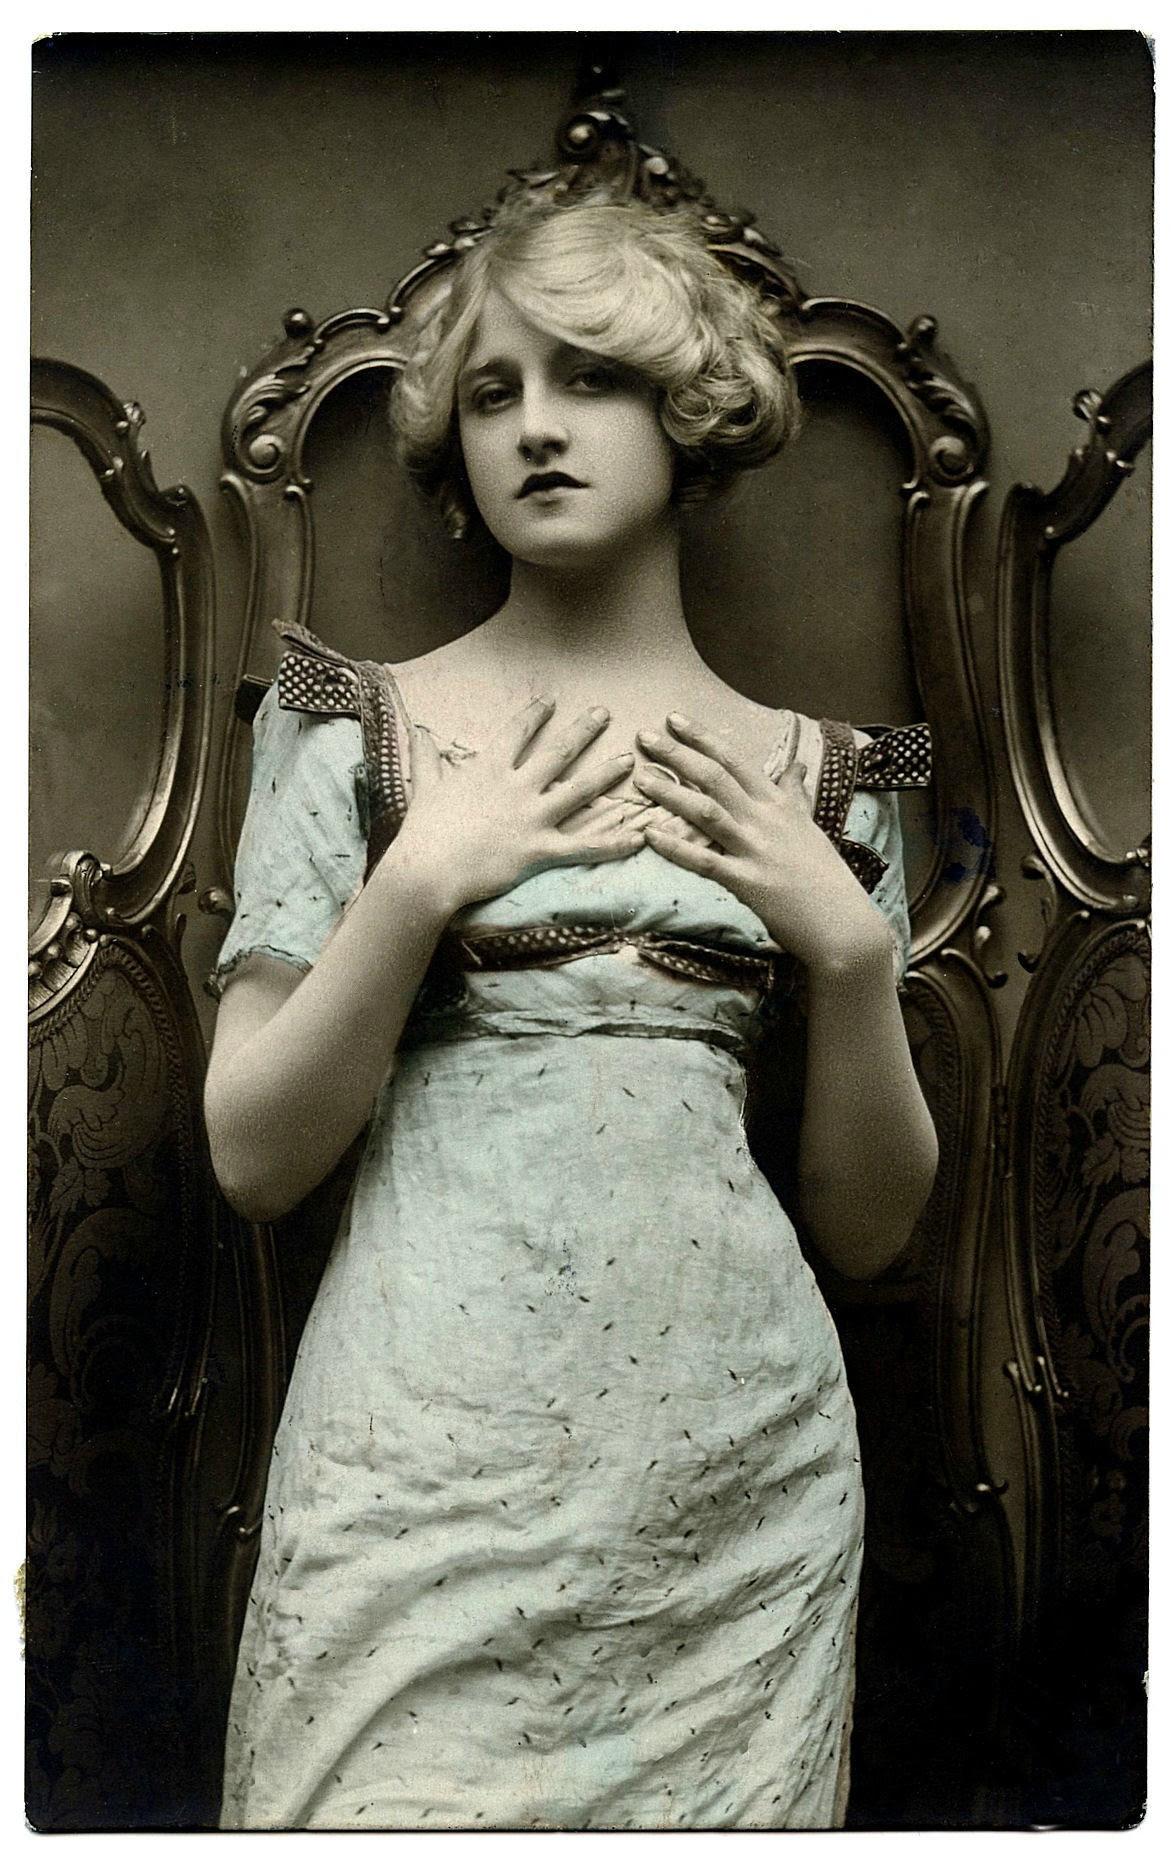 Boobs Artistic Nude Photography Gallery Vintage Scenes